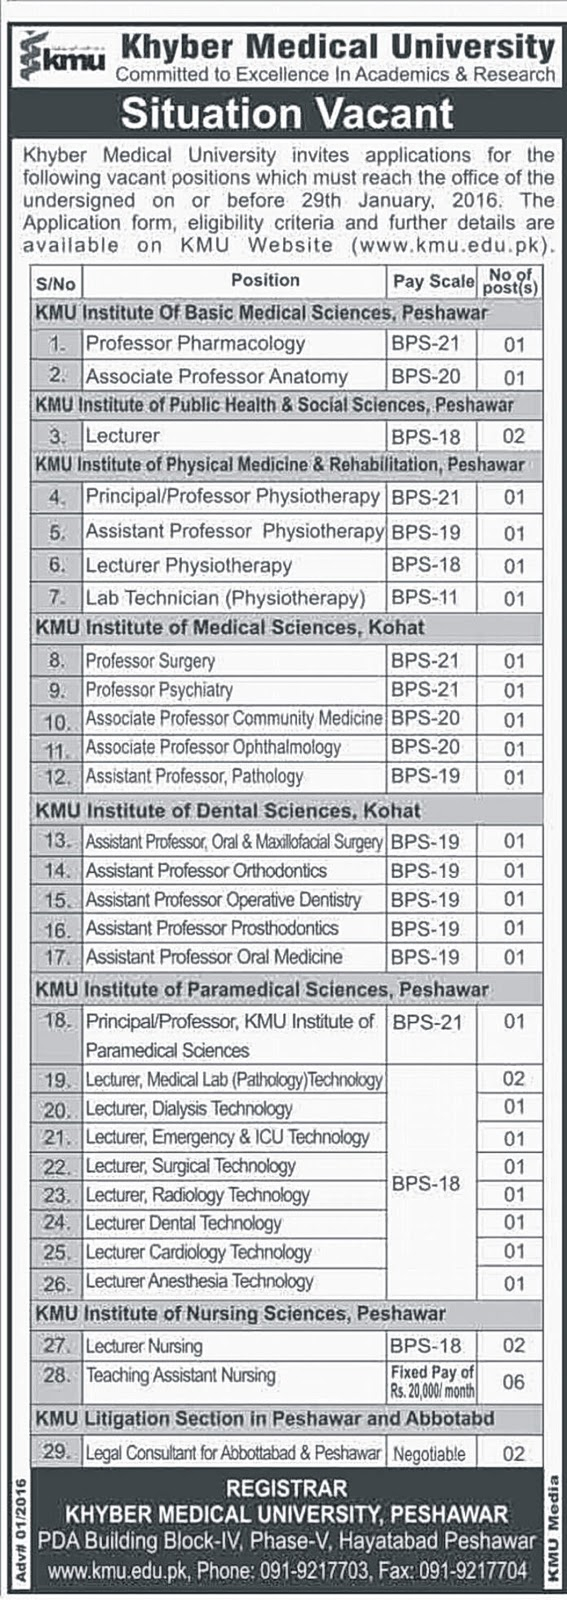 MBBS Doctors Teaching Jobs in Khyber Medical University